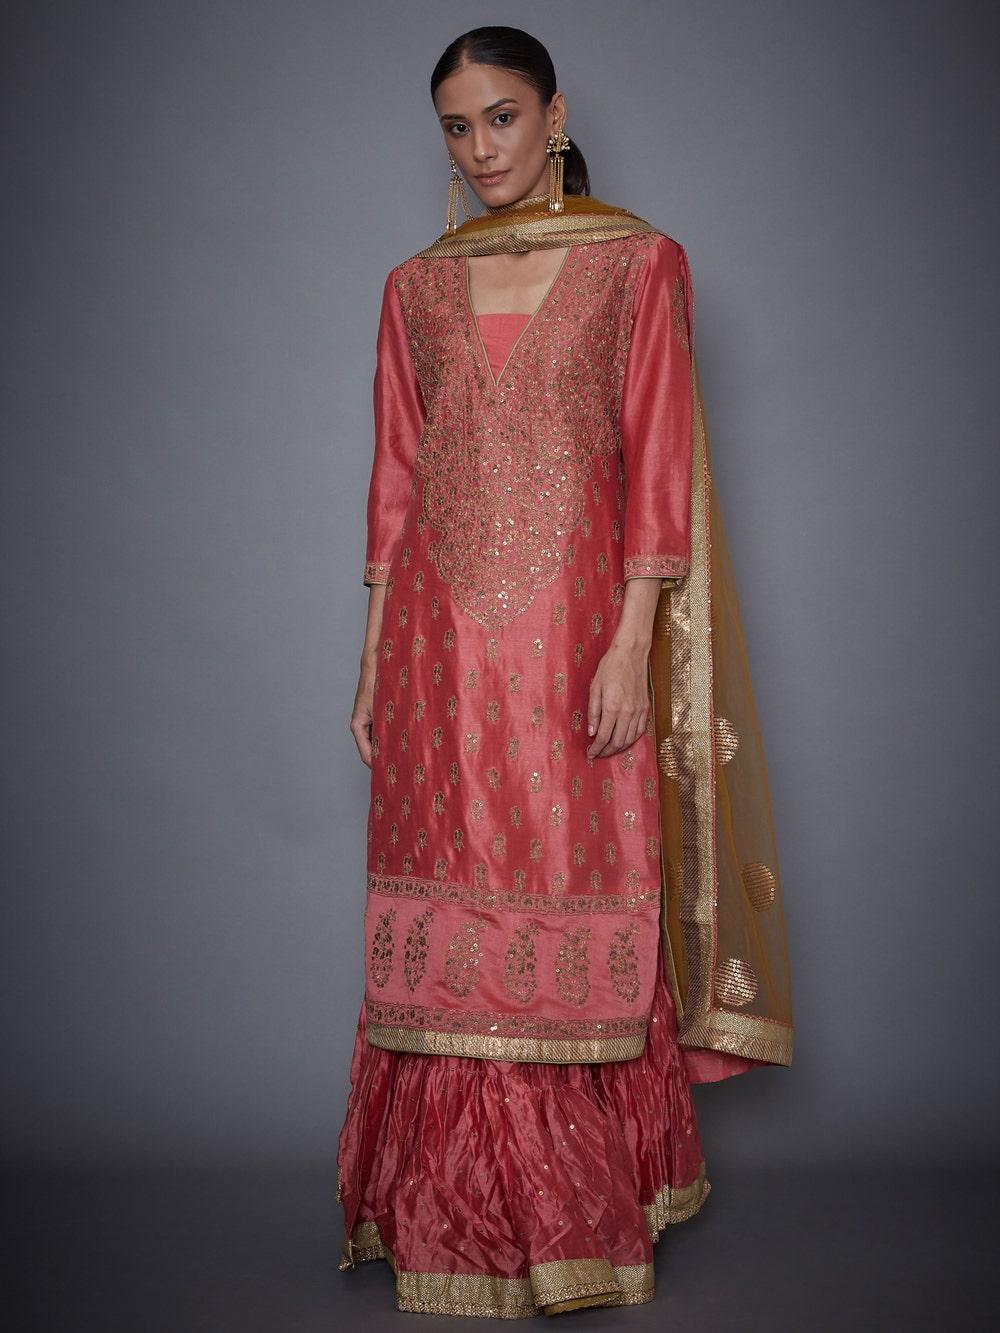 Coral & Khaki Nawabi Embroidered Kurta With Skirt And Dupatta